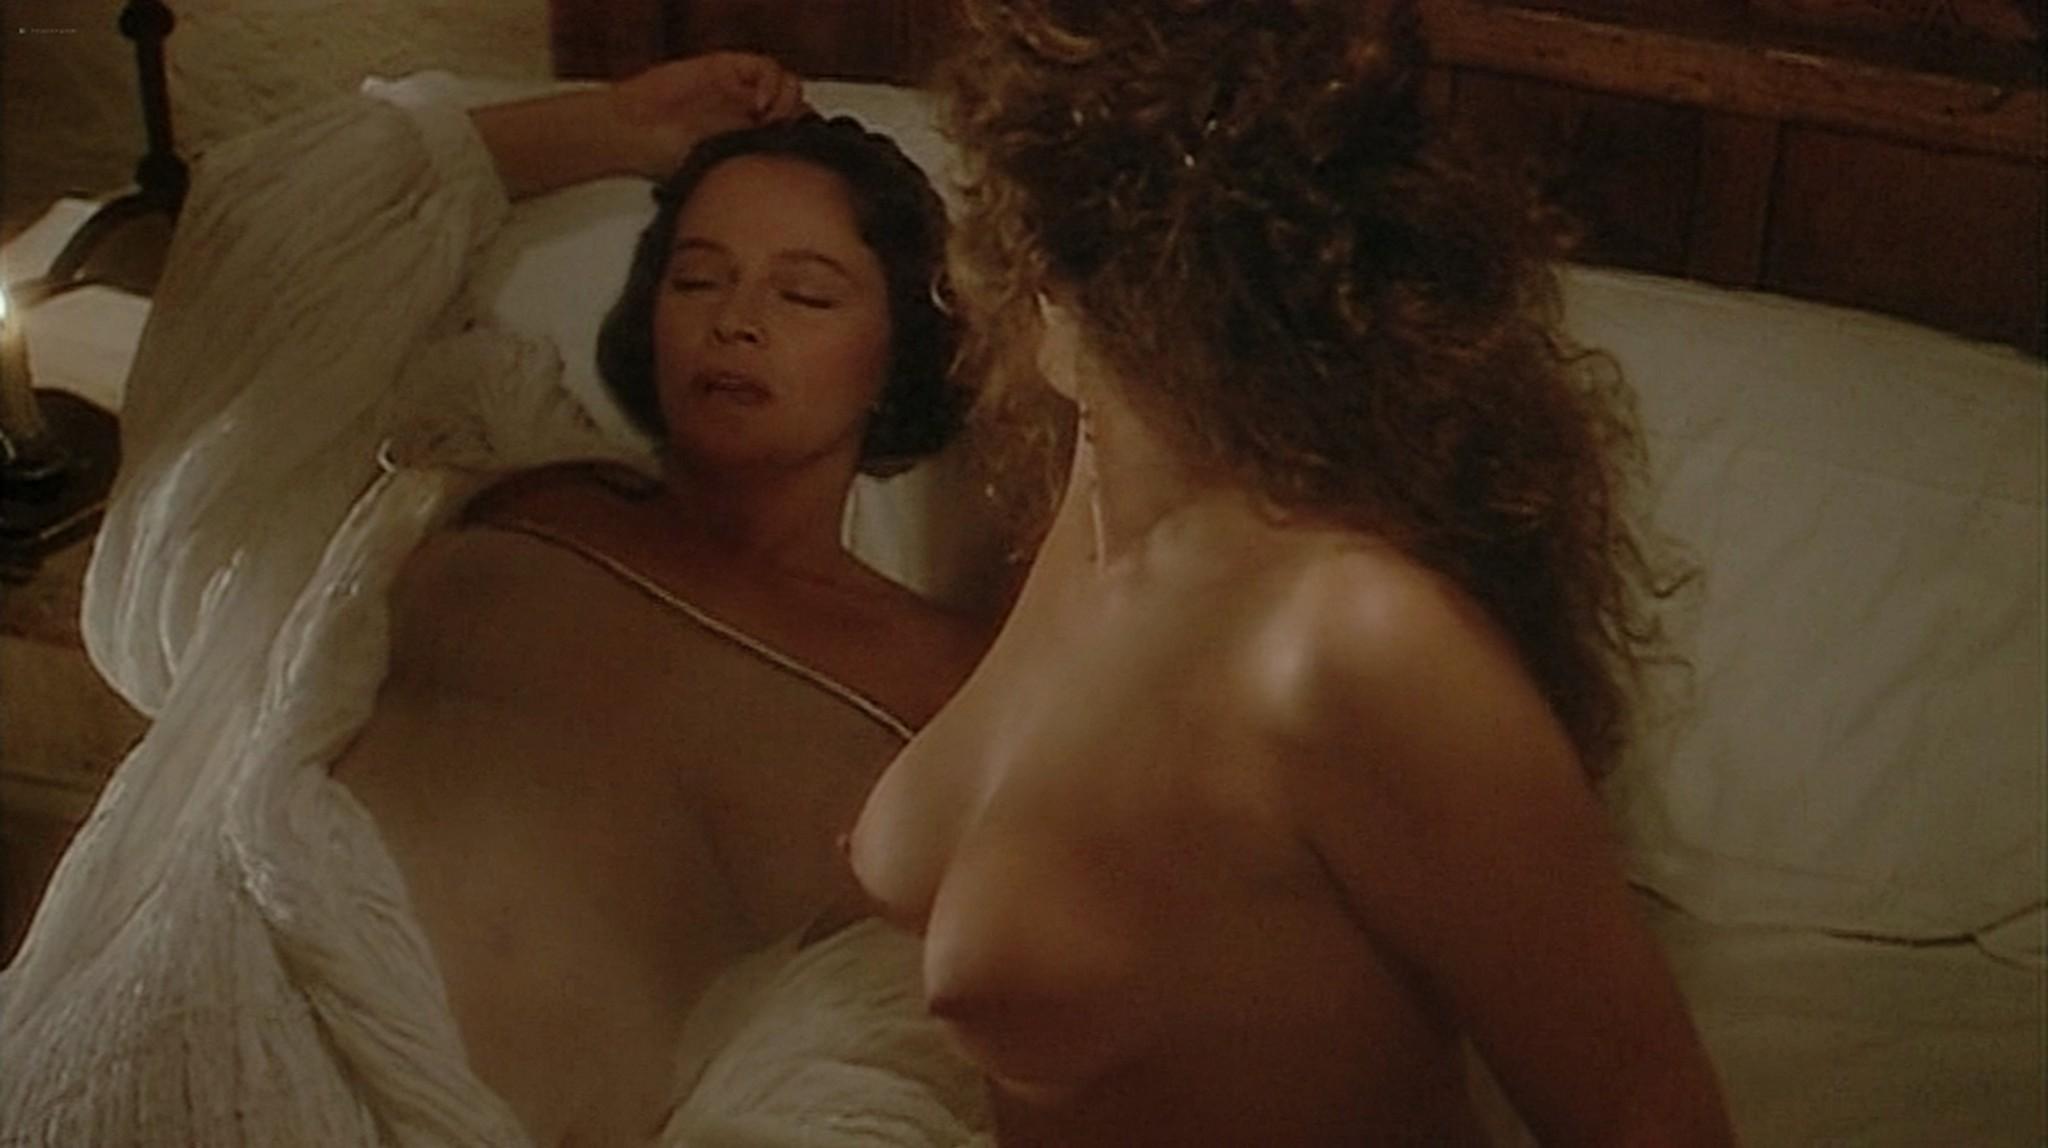 Laura Antonelli nude topless and sex Monica Guerritore nude topless and Clelia Rondinella nude lesbian sex La Venexiana 1986 DVDRip 5